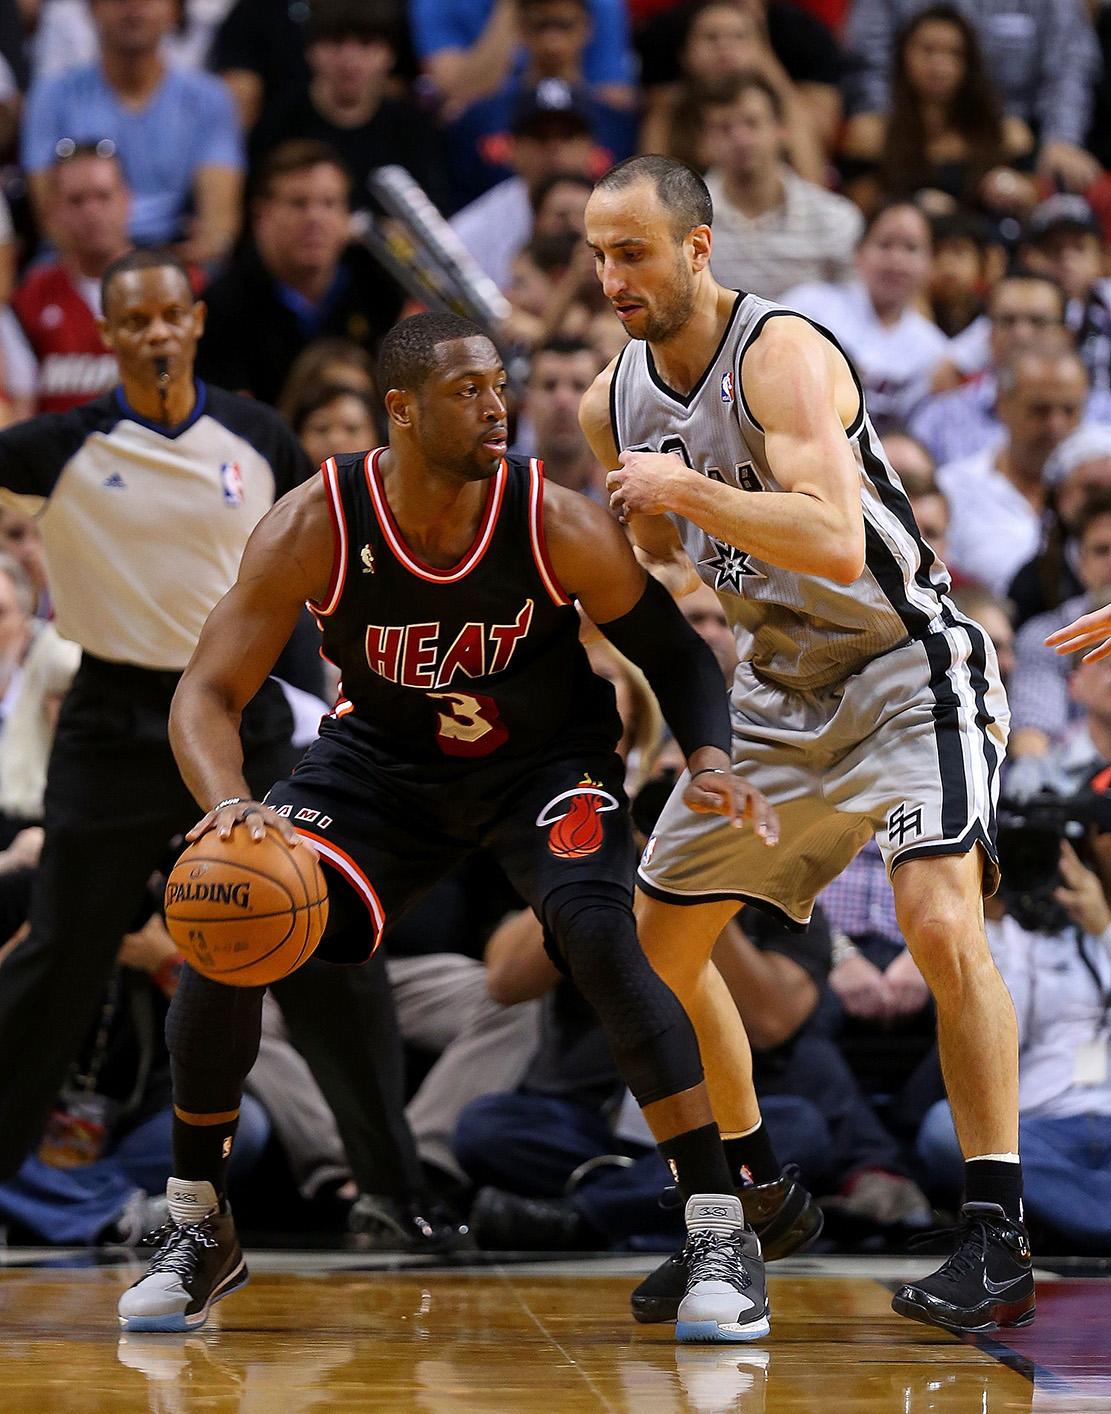 Dwyane Wade & Manu Ginóbili en viva basquet